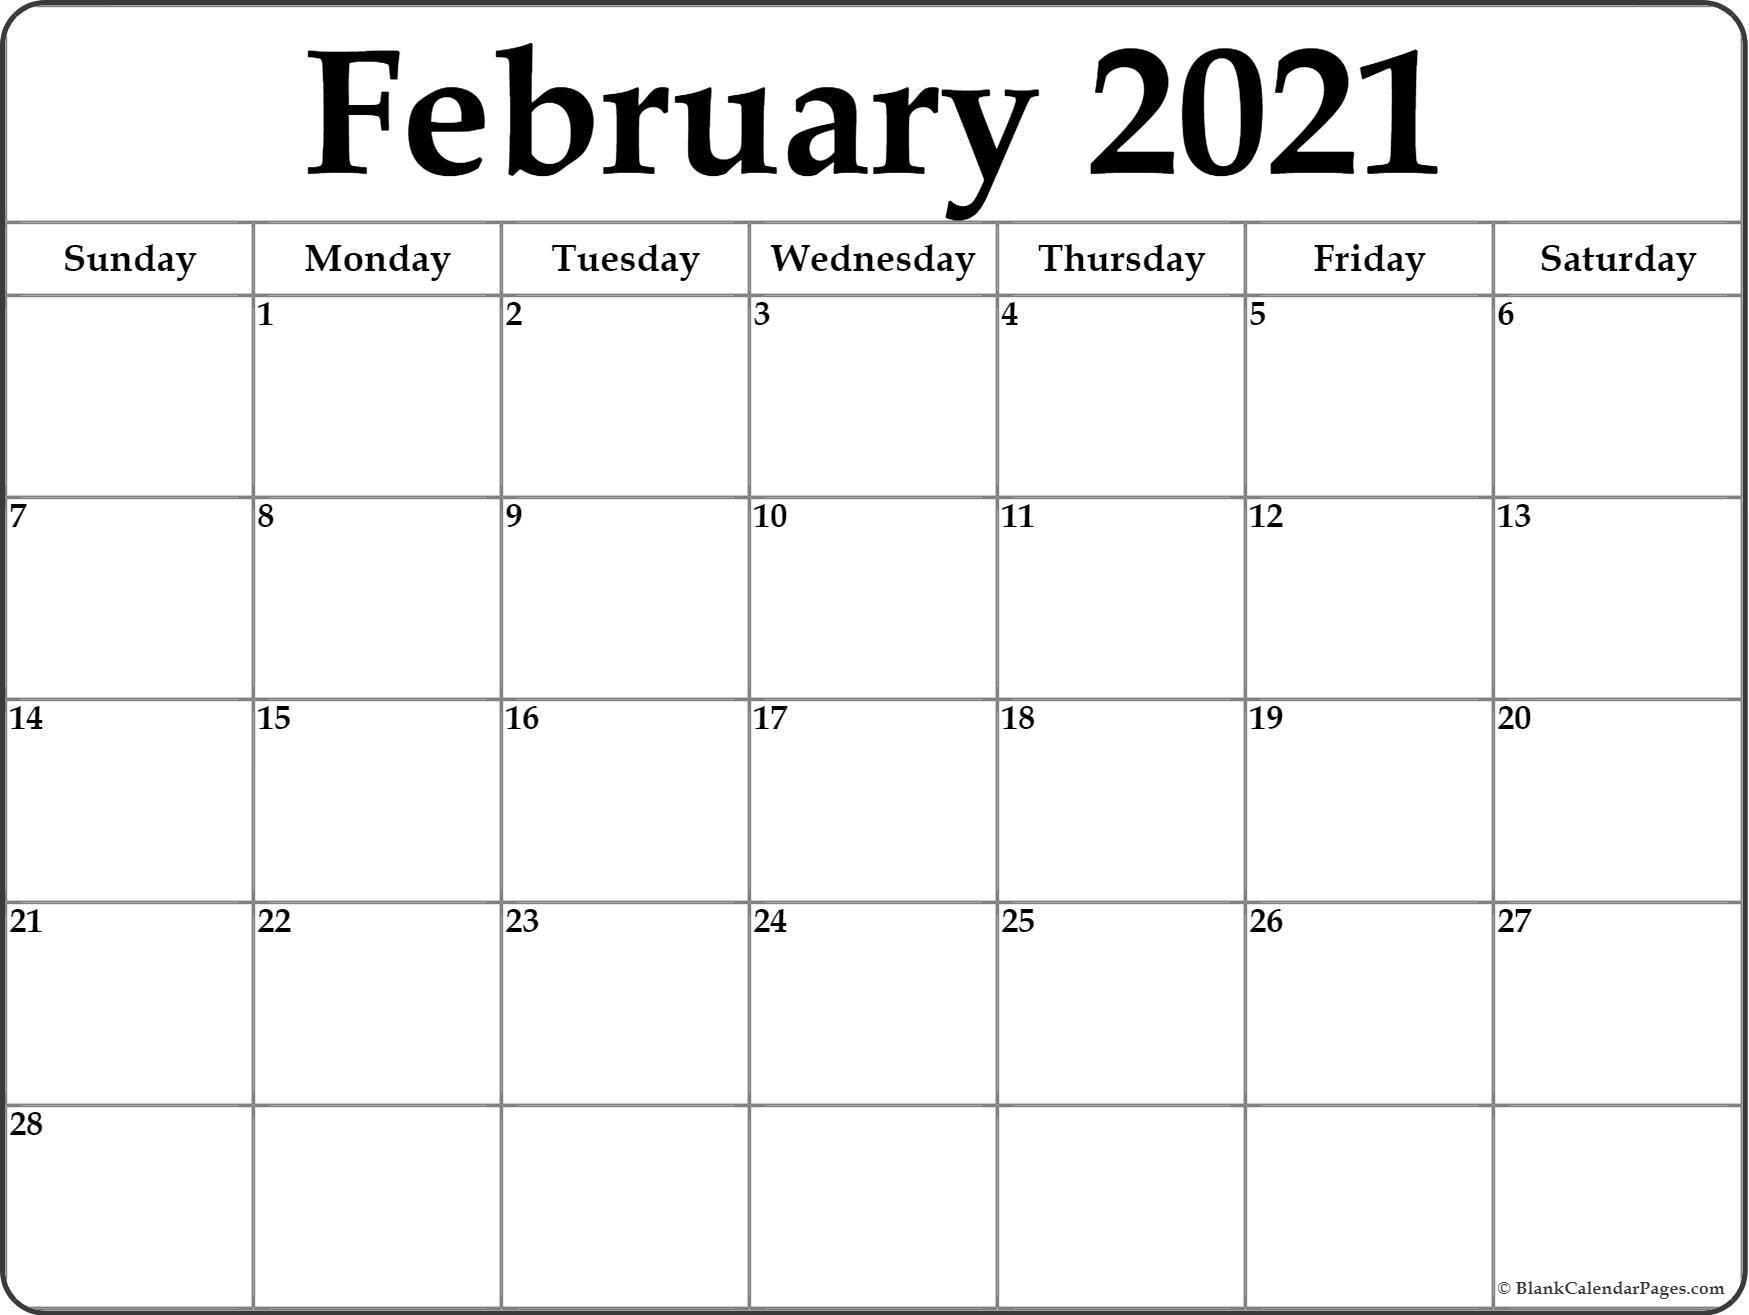 February 2021 Calendar | Free Printable Monthly Calendars  2021 Printable Calendar By Month